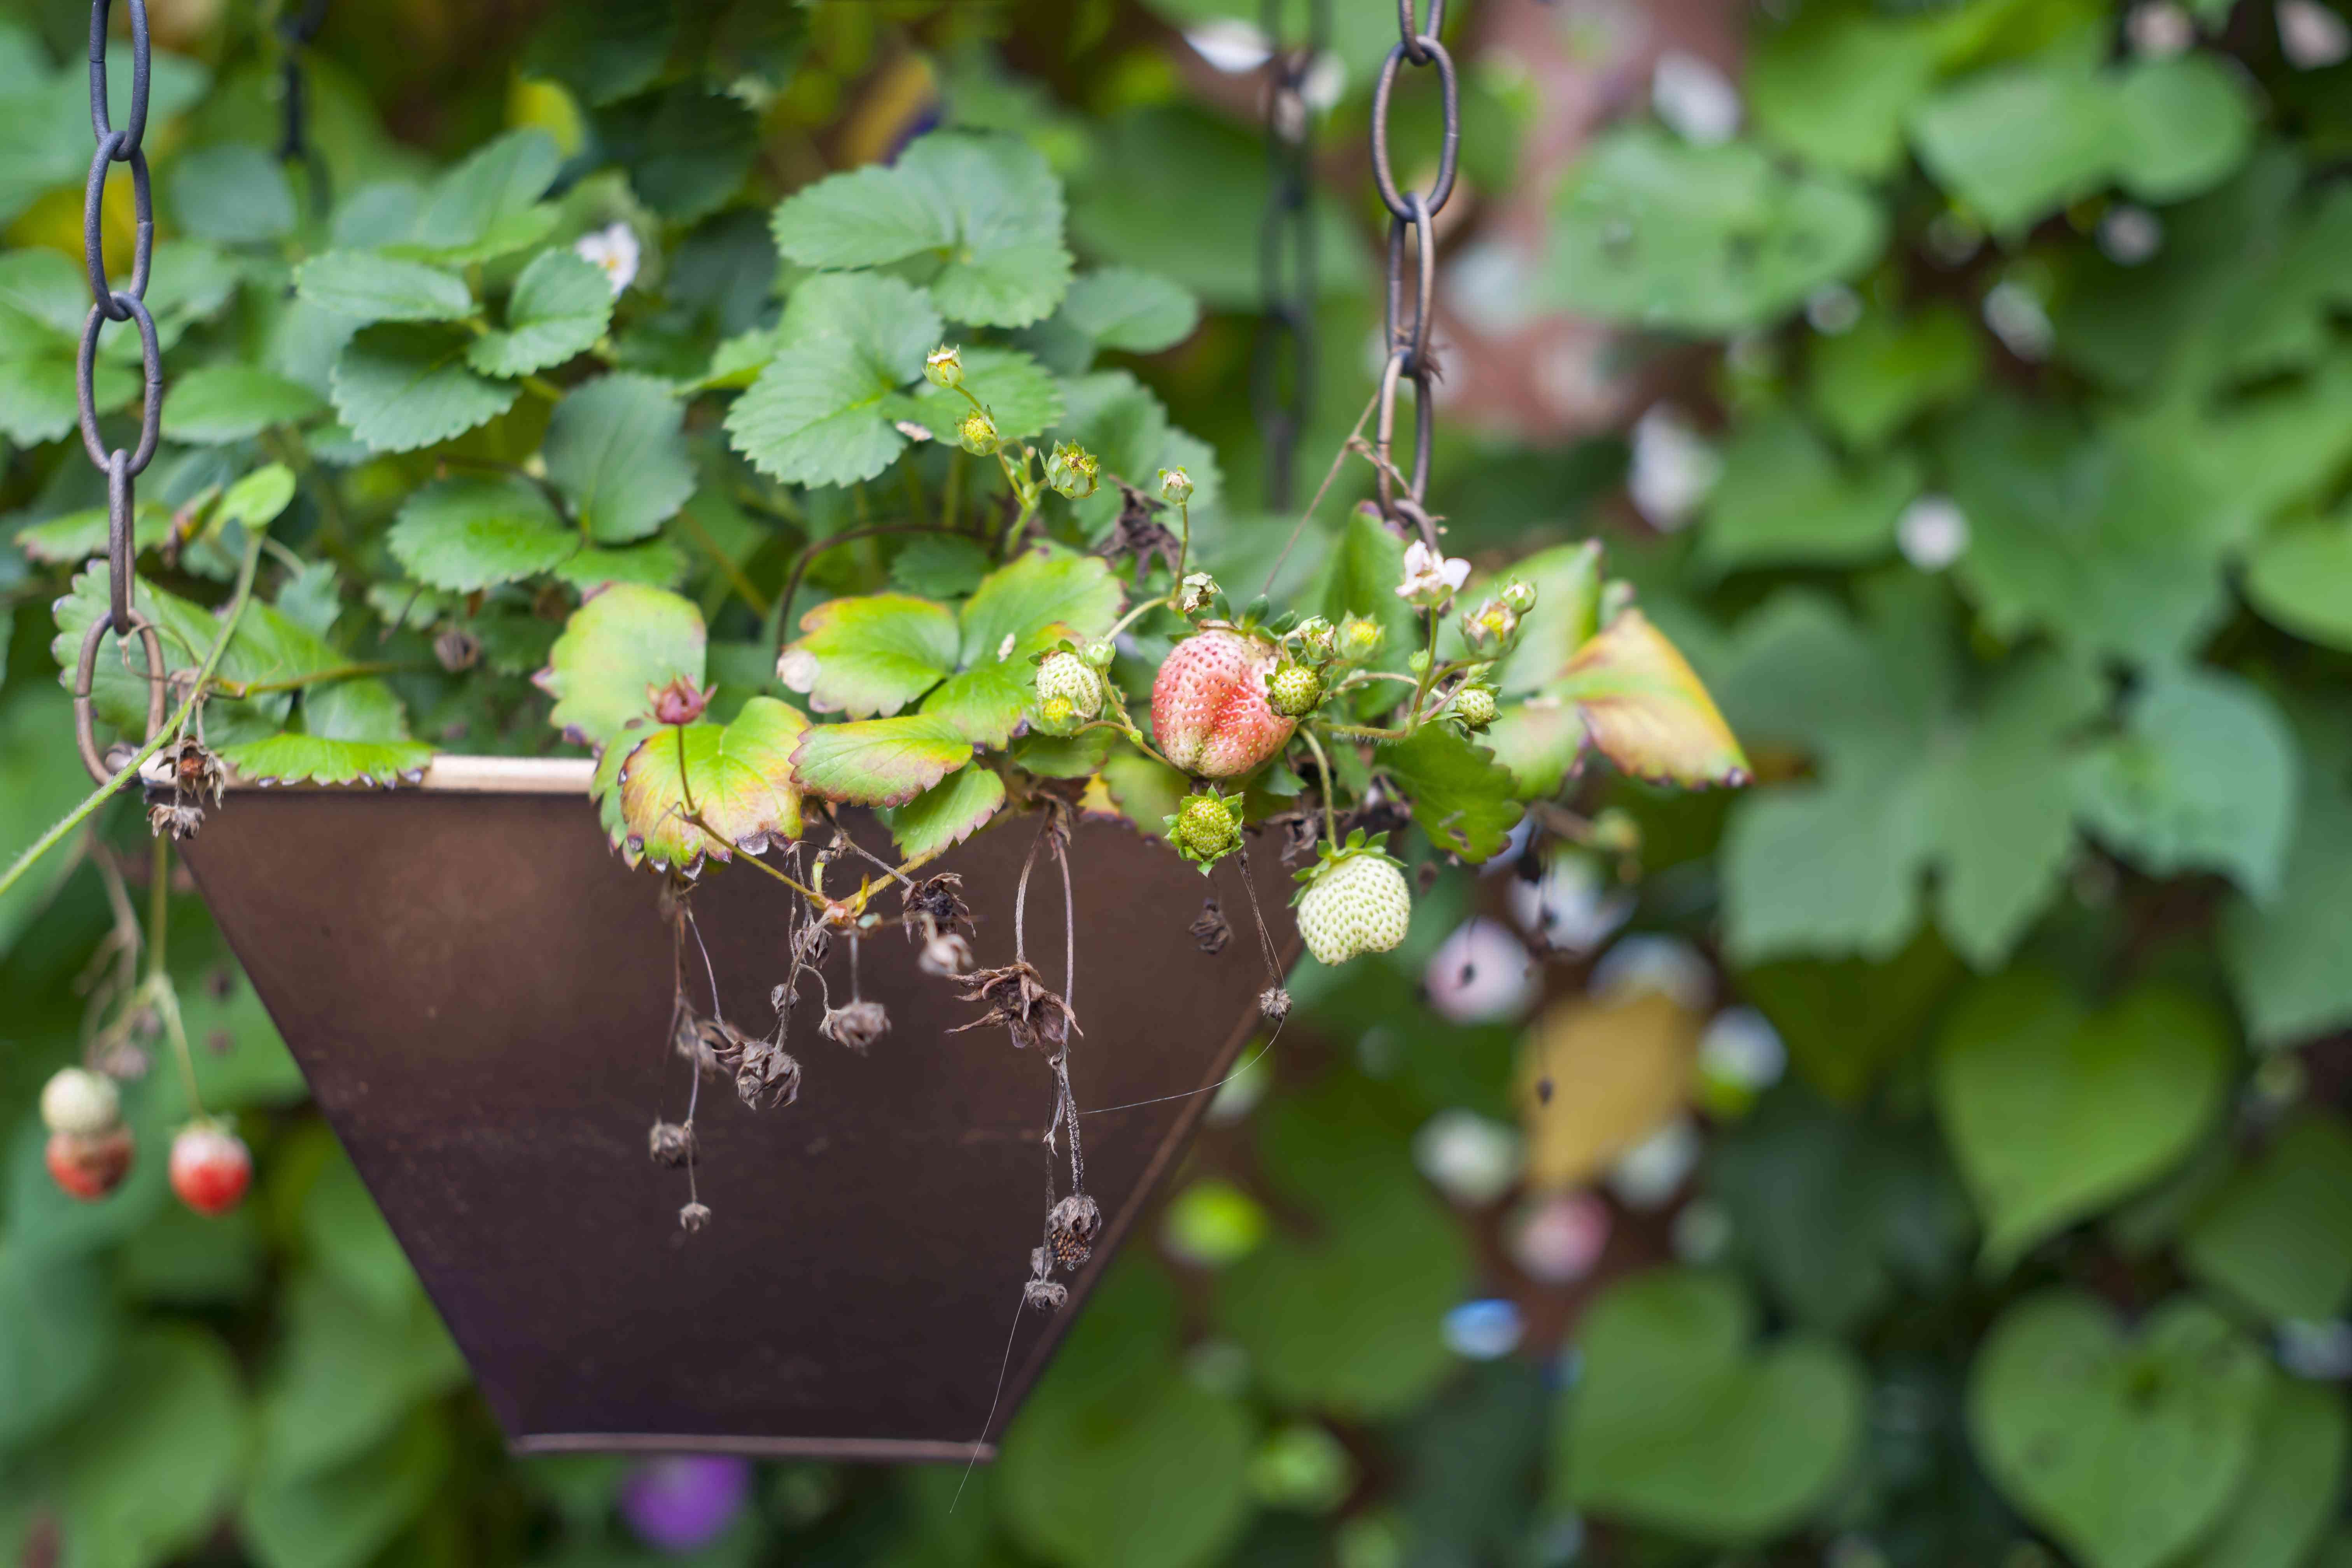 Growing strawberry in a backyard